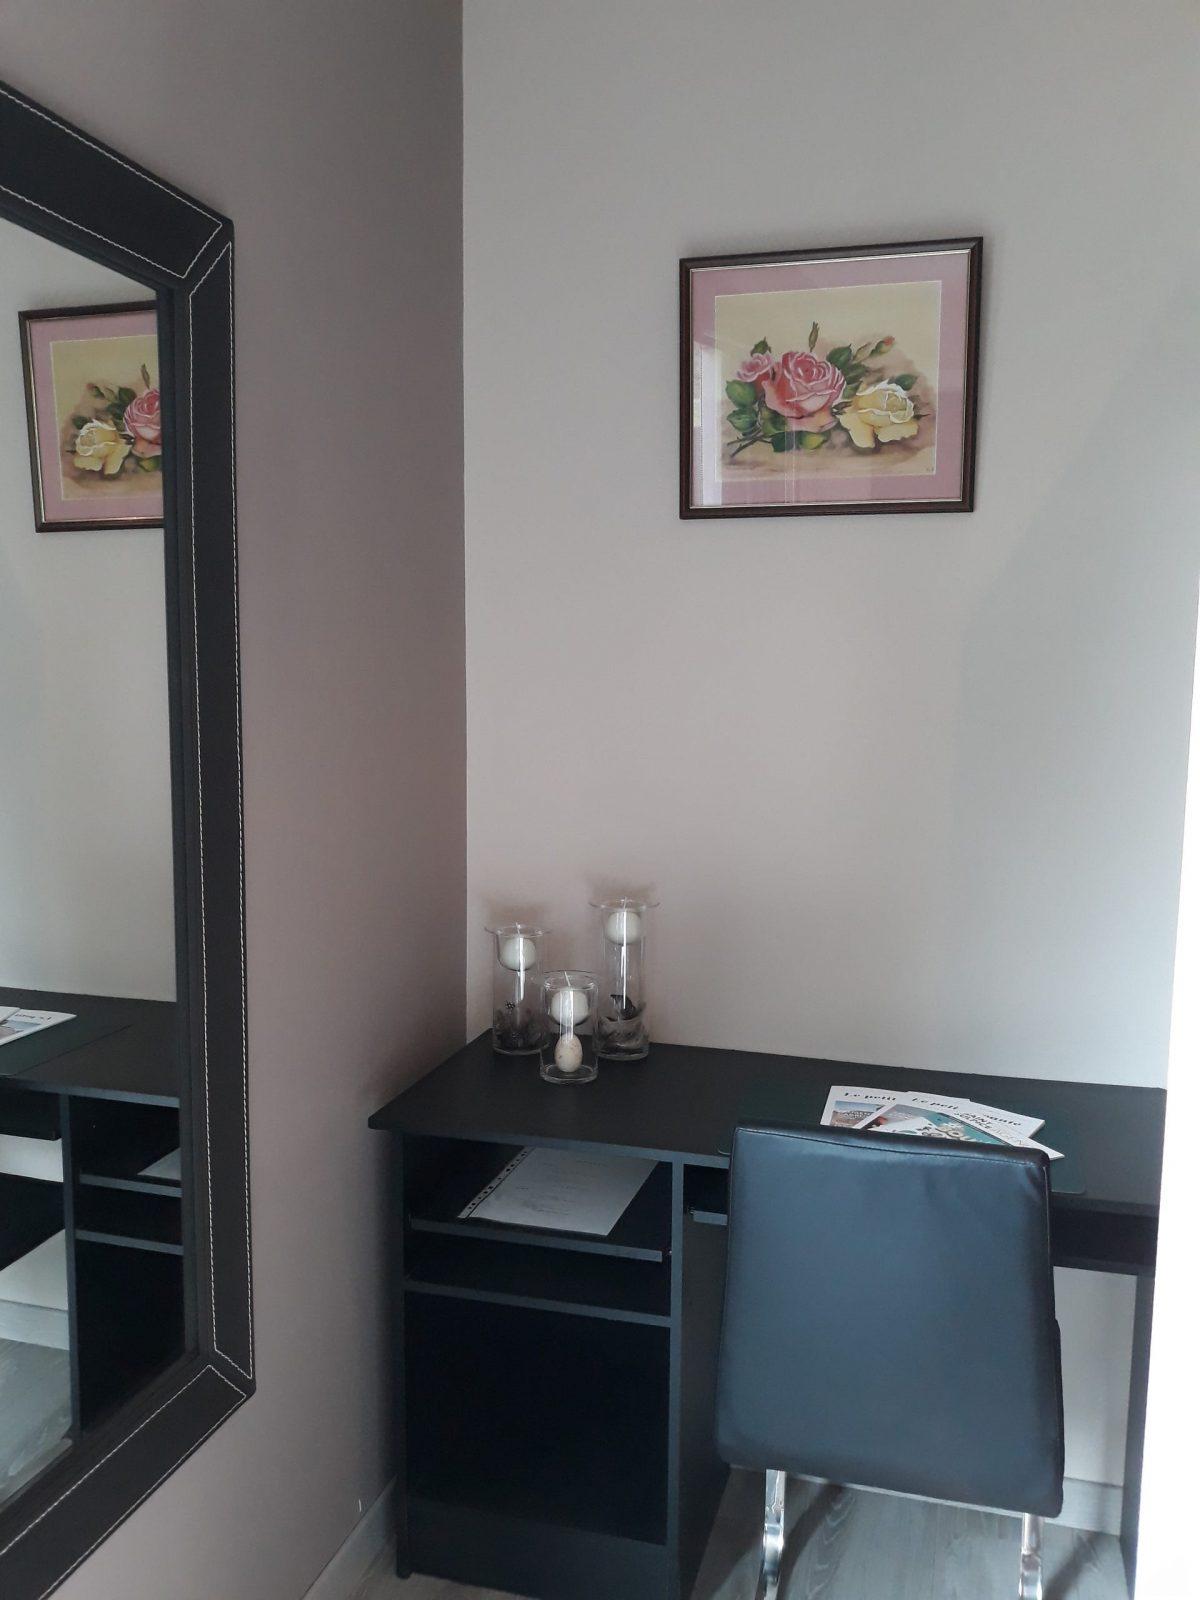 Chambres d'Hôtes L'Ortalet 81 – Saint-Sulpice – Tarn